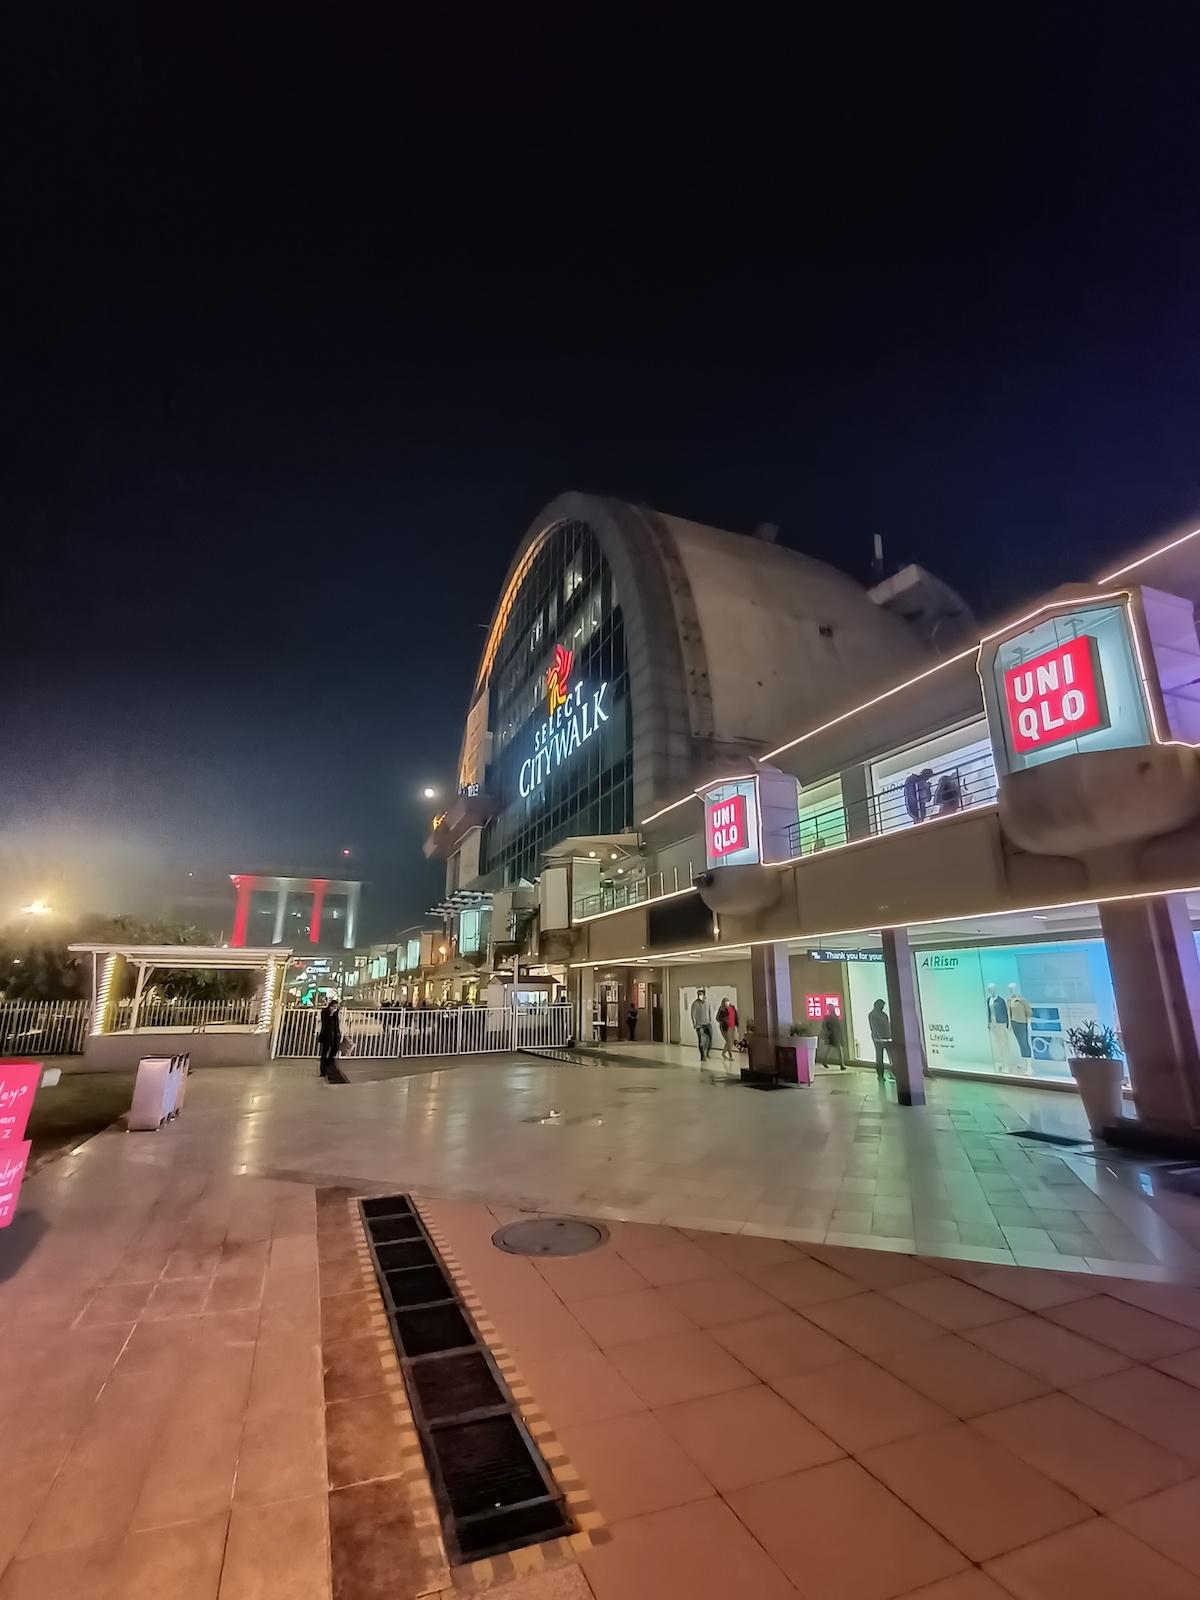 Ultra-wide Camera (Night Mode On)